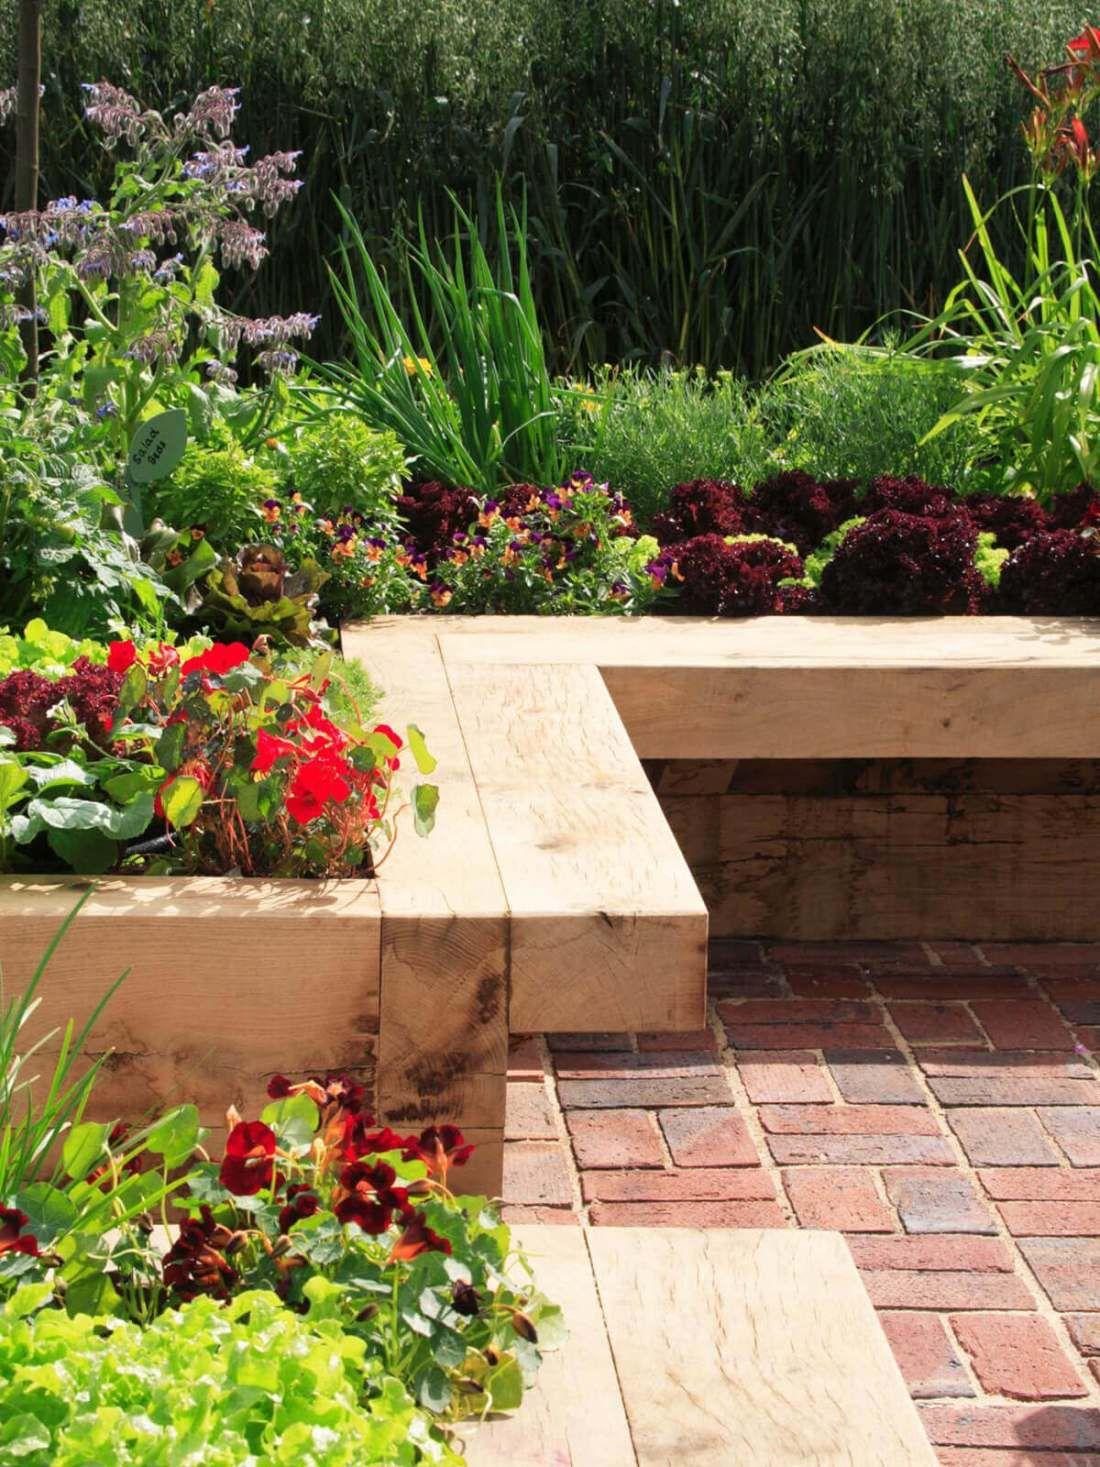 68 lawn edging ideas that will transform your garden